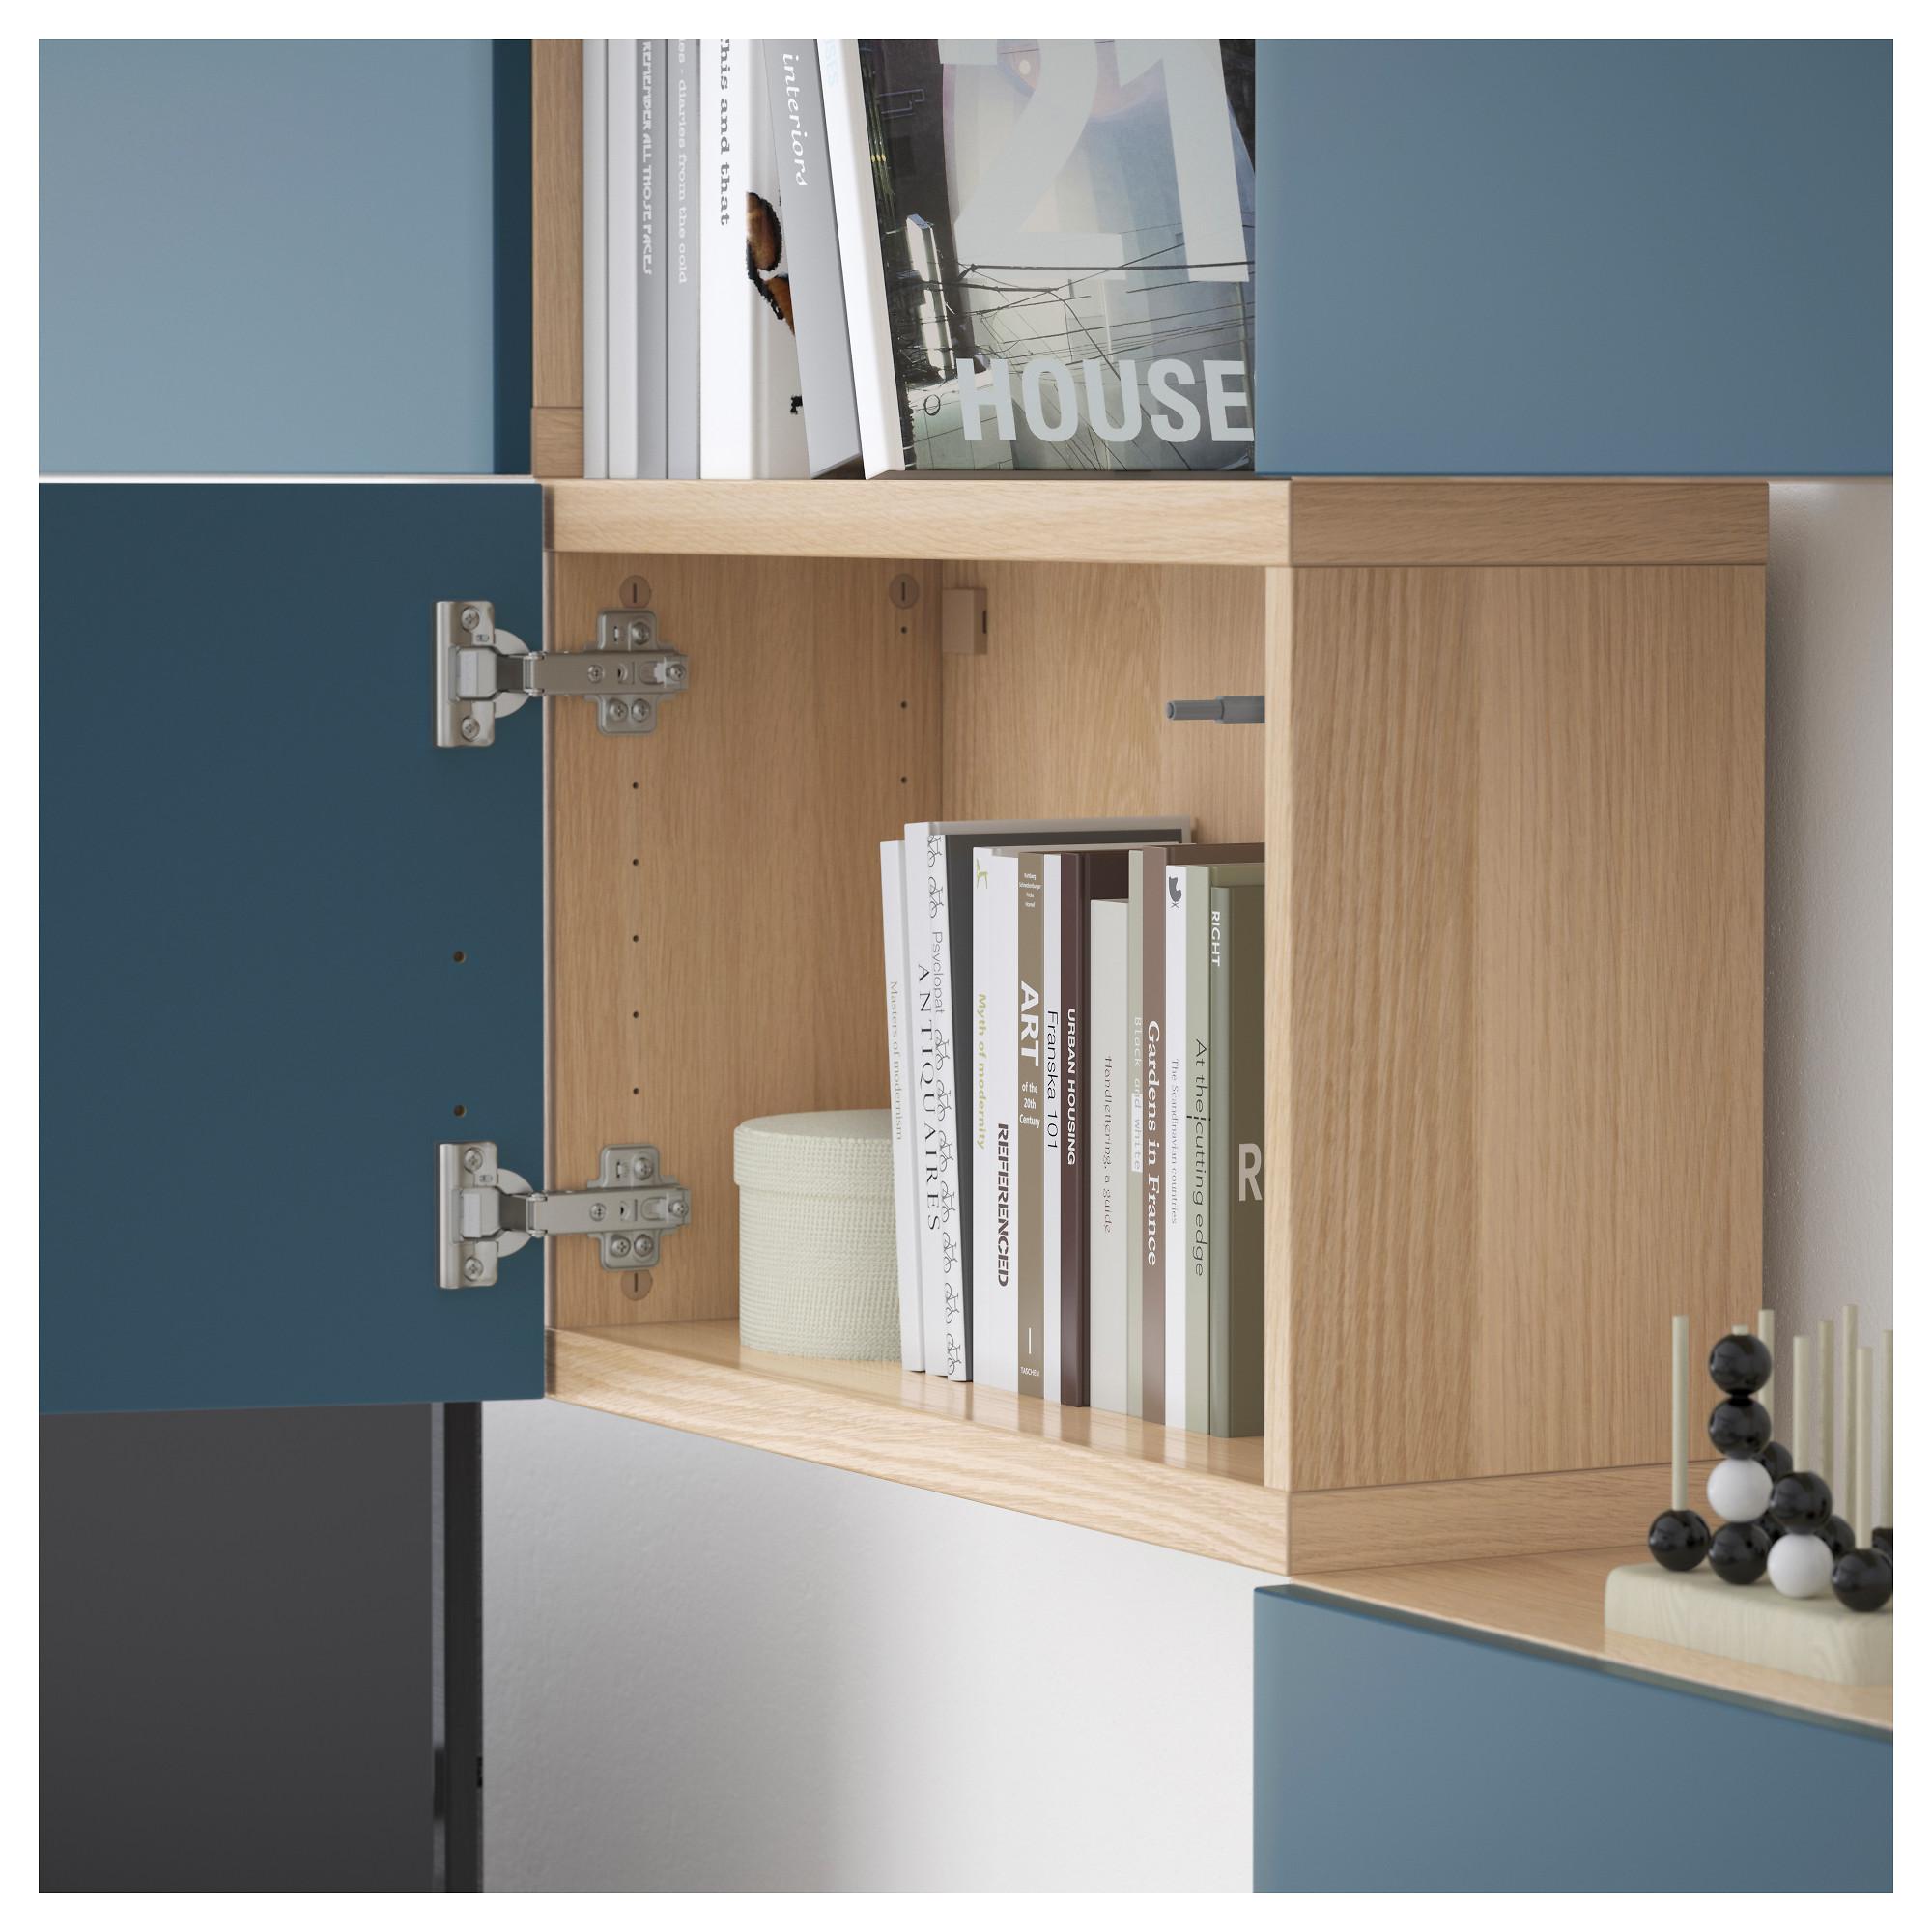 Шкаф для ТВ, комбинация БЕСТО темно-синий артикуль № 792.516.65 в наличии. Интернет каталог IKEA Беларусь. Недорогая доставка и установка.